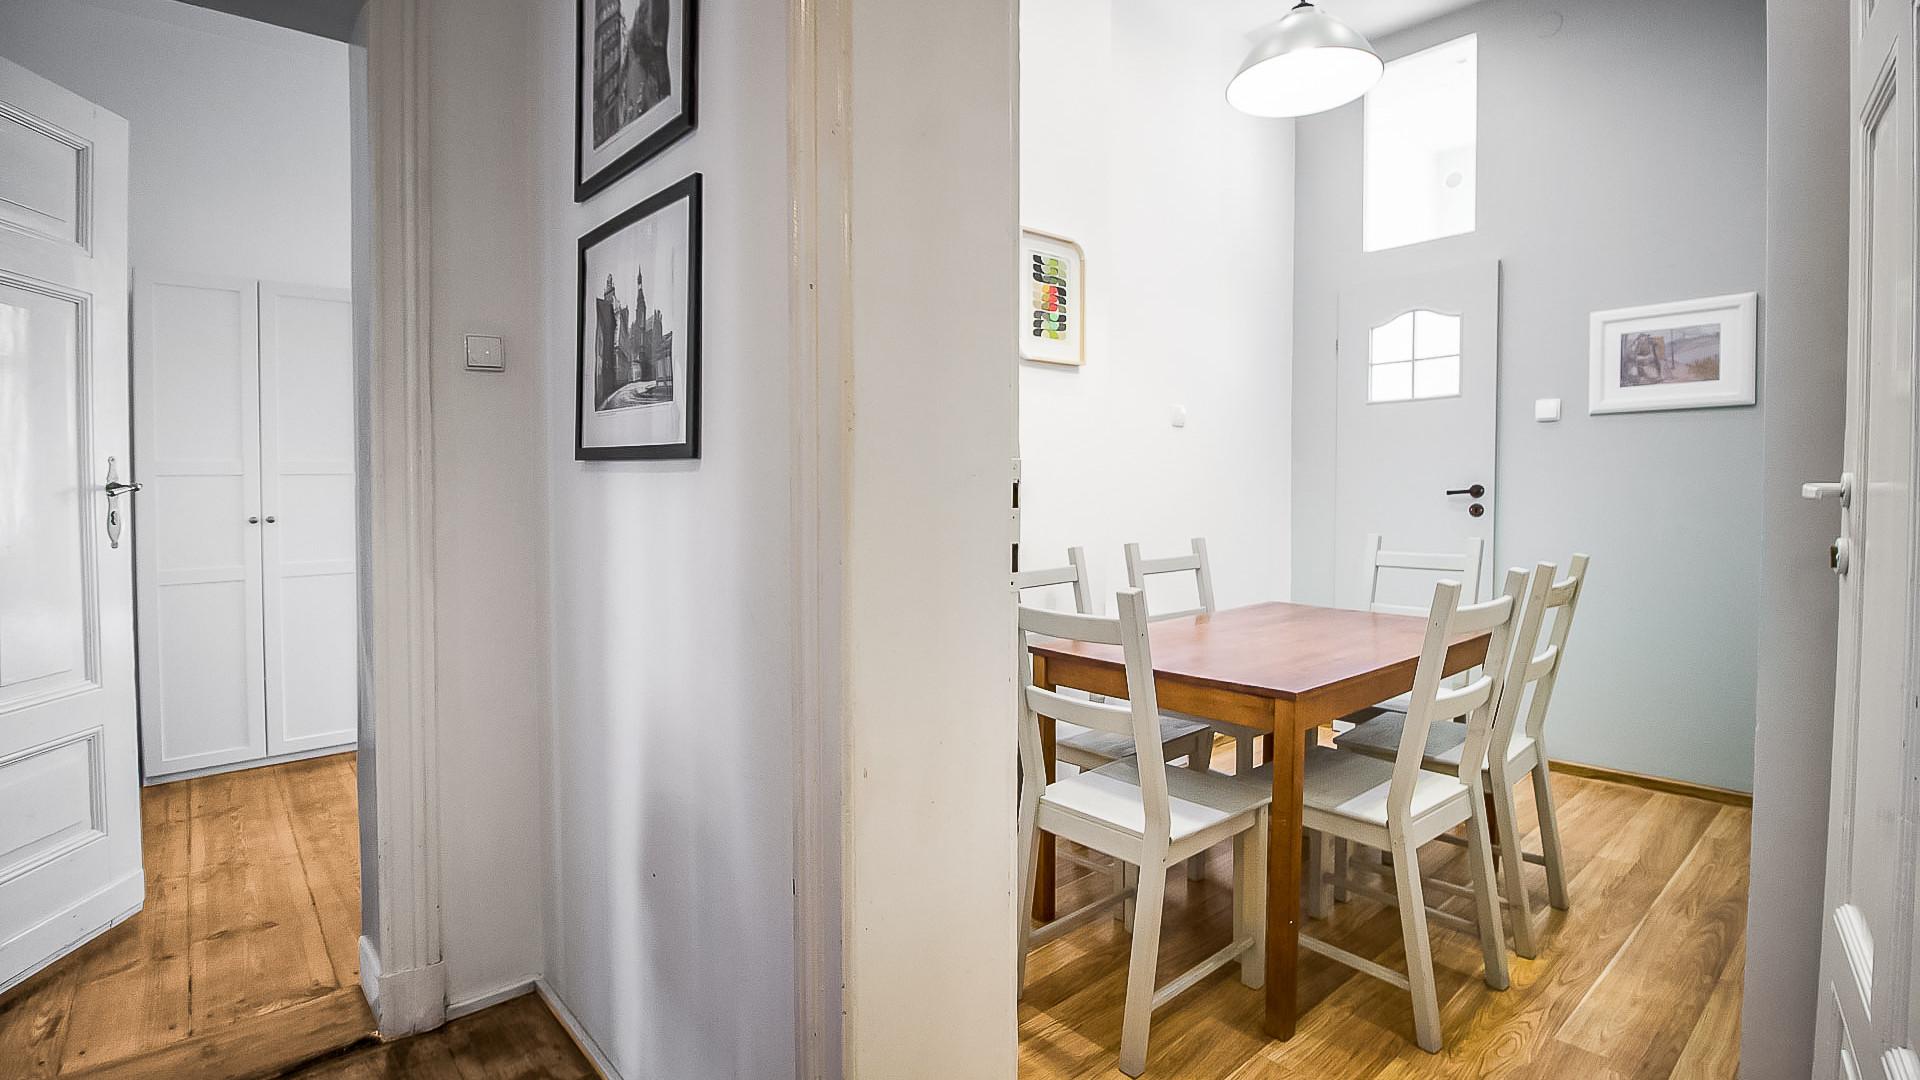 Apartment 6 7 8 osob Poznan Old Town (10